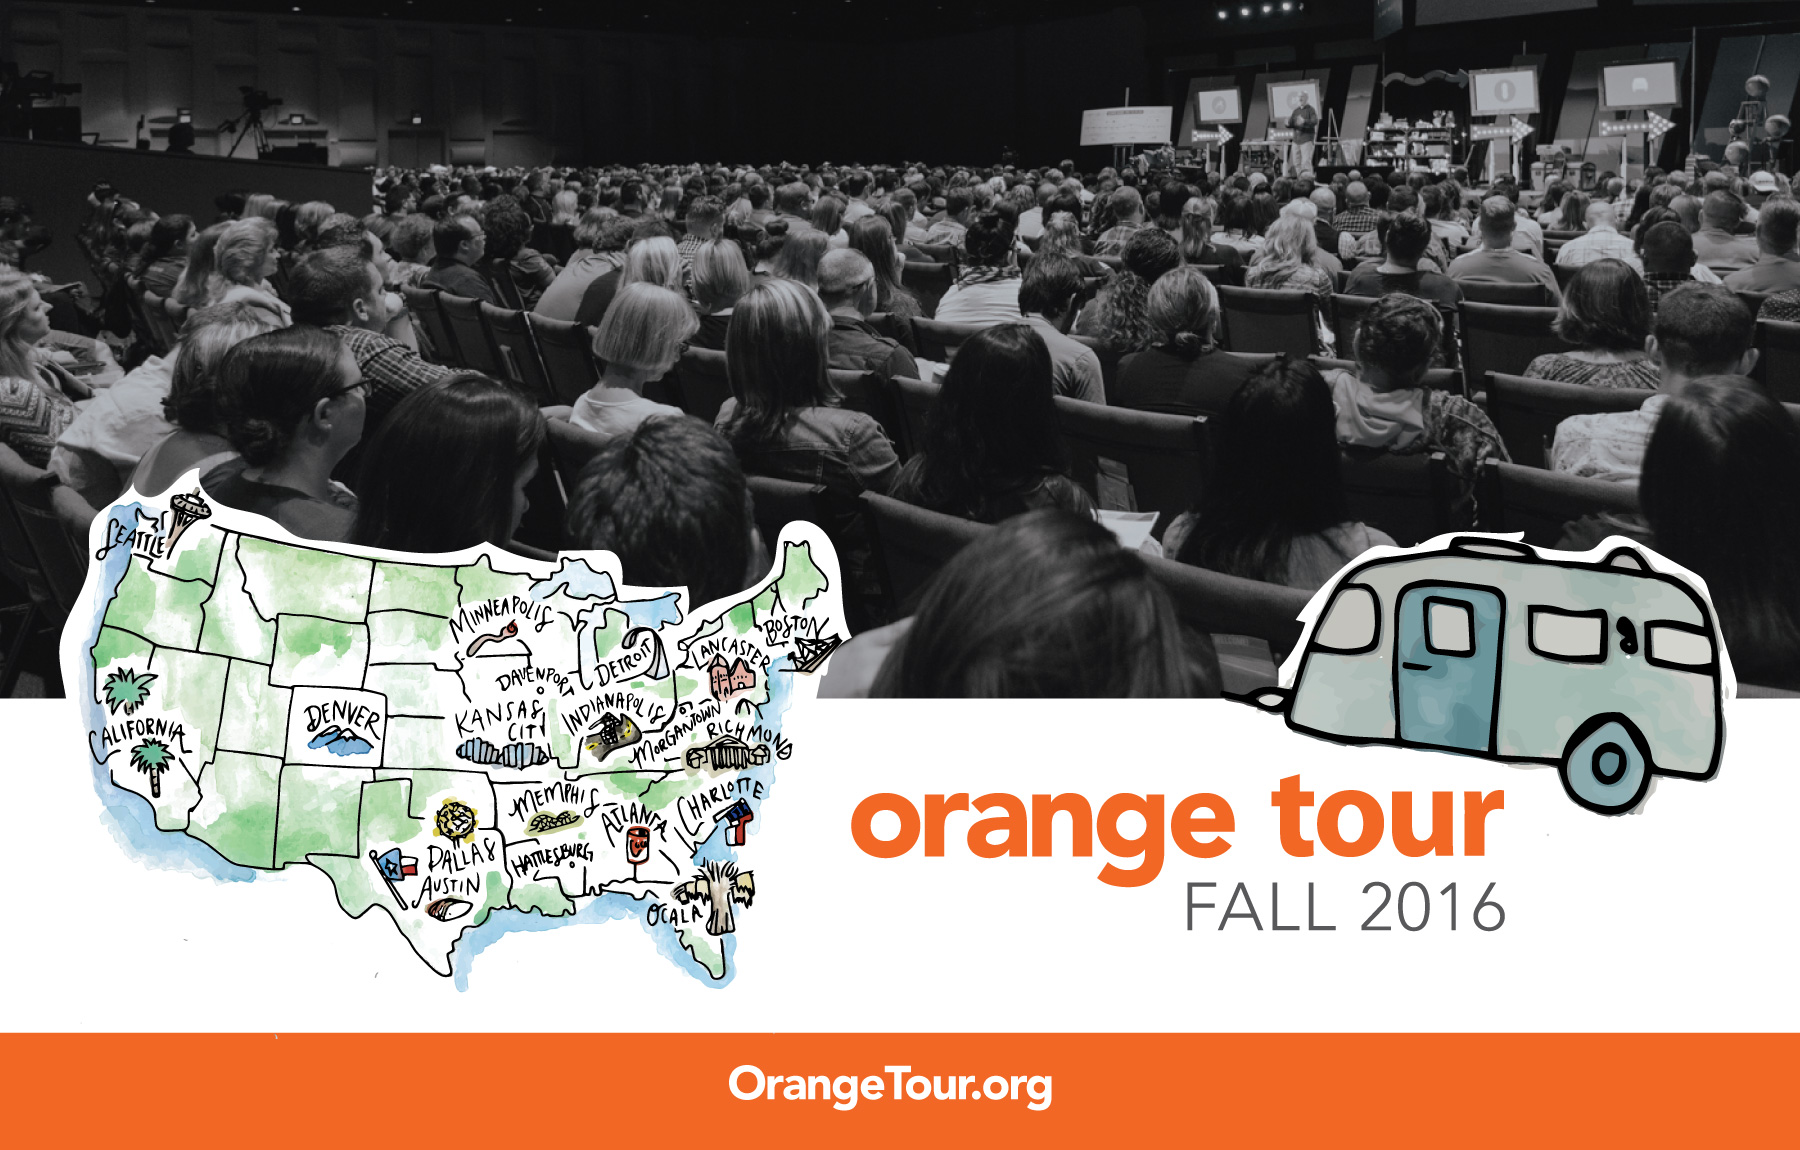 Orange Tour: The Gamechanger Everyone Needs